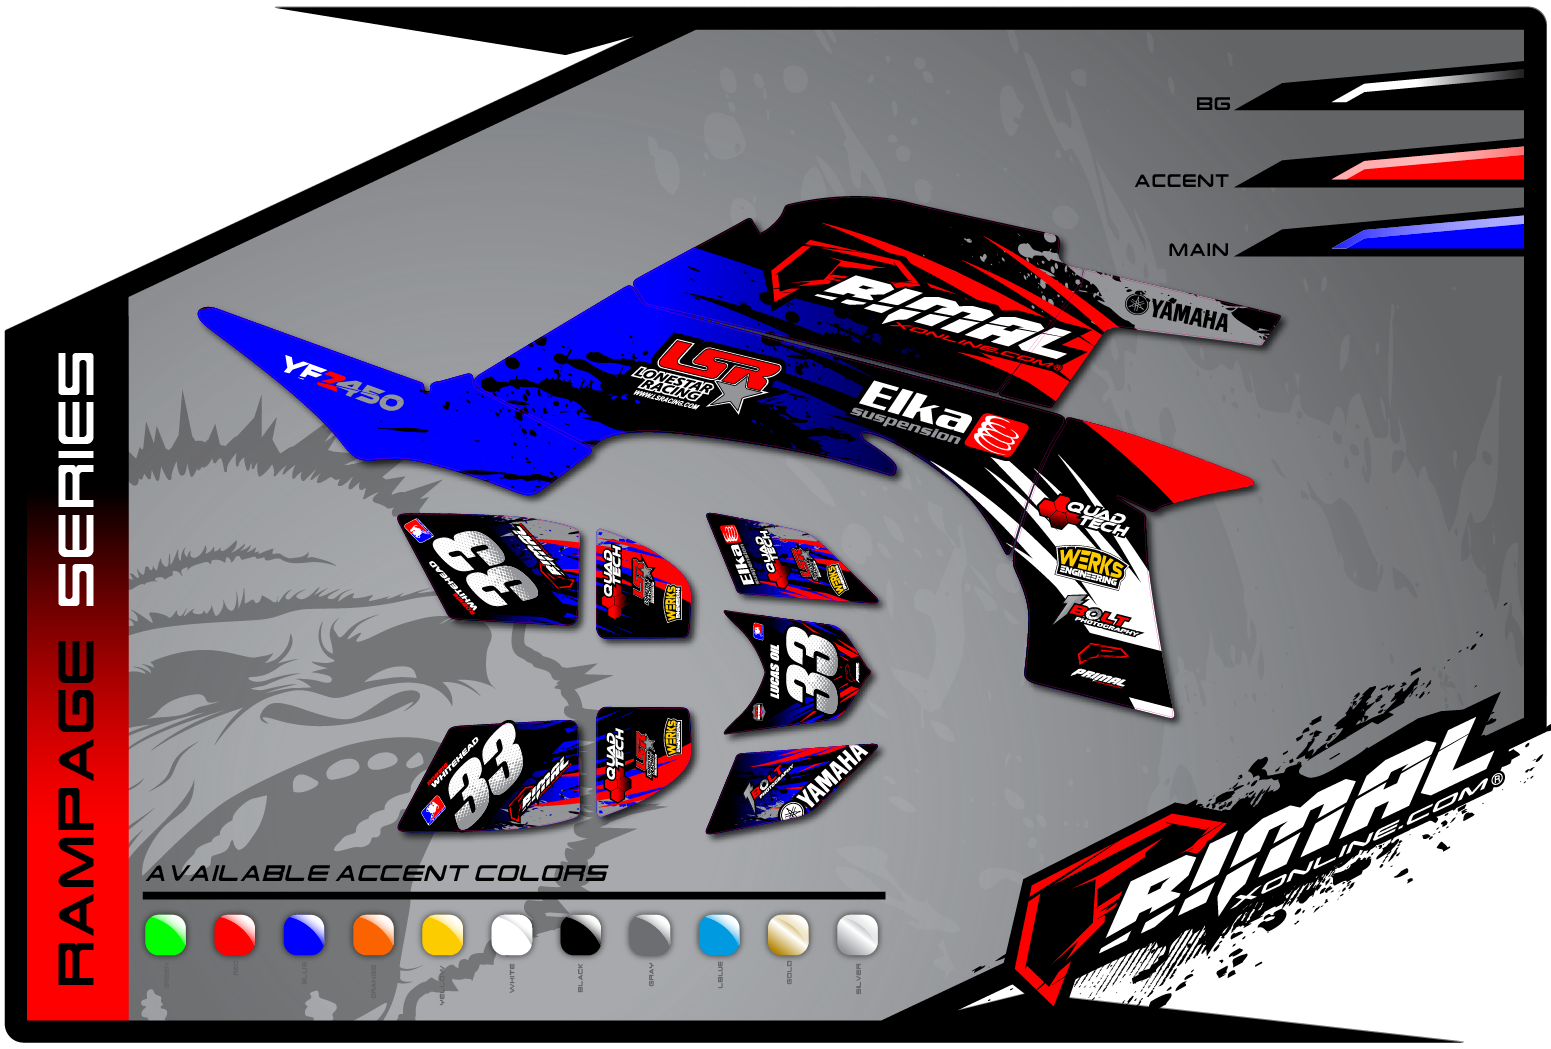 Primal X Motorsports MX Graphics ATV GRAPHICS TRX 450 Rampage